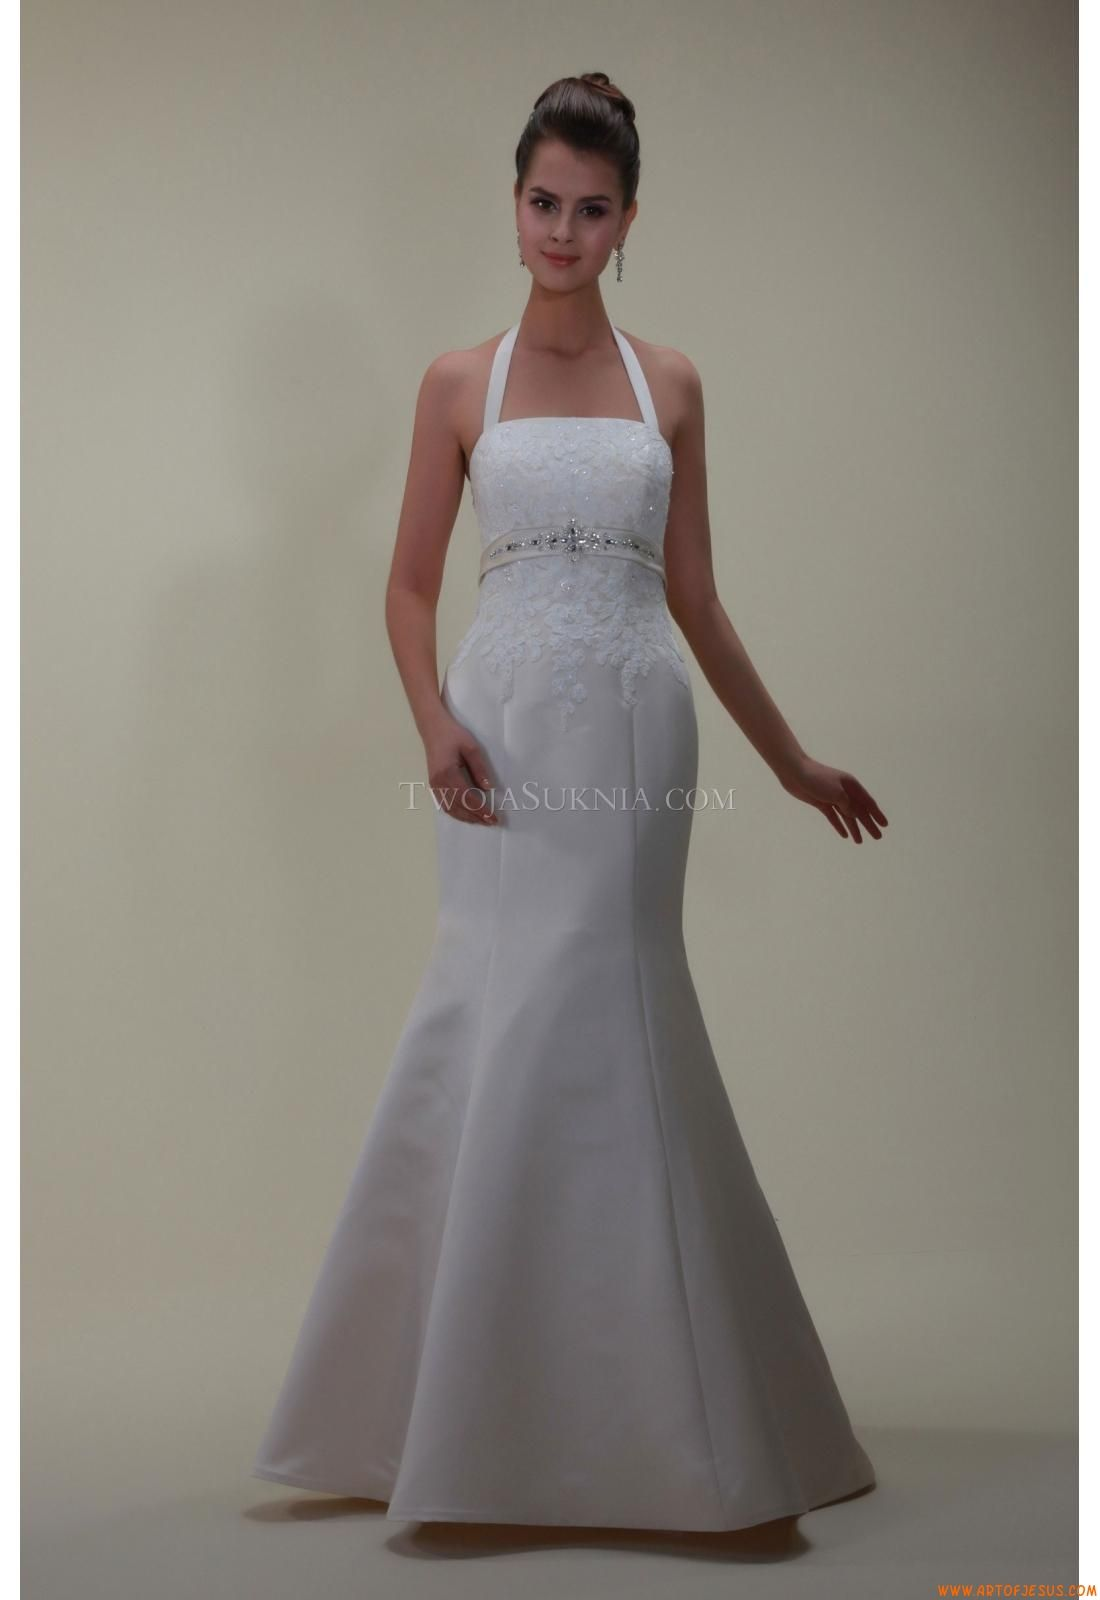 Vestidos de novia baratos castellon